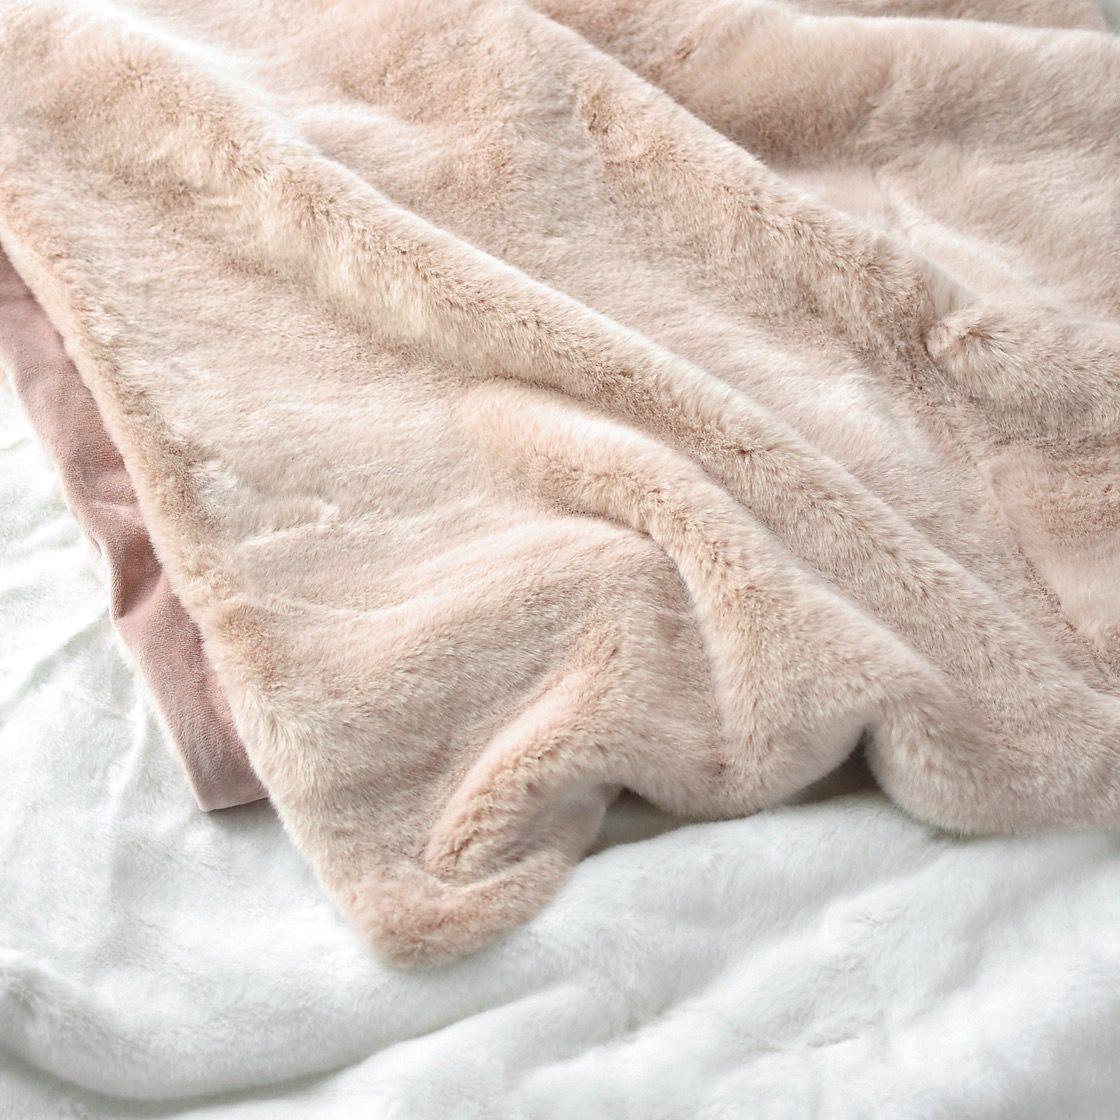 Blush Pink Throw Blanket Custom Blush Pink Dusty Rose Gold Faux Fur Throw Blanket A Cozy Millennial 2018